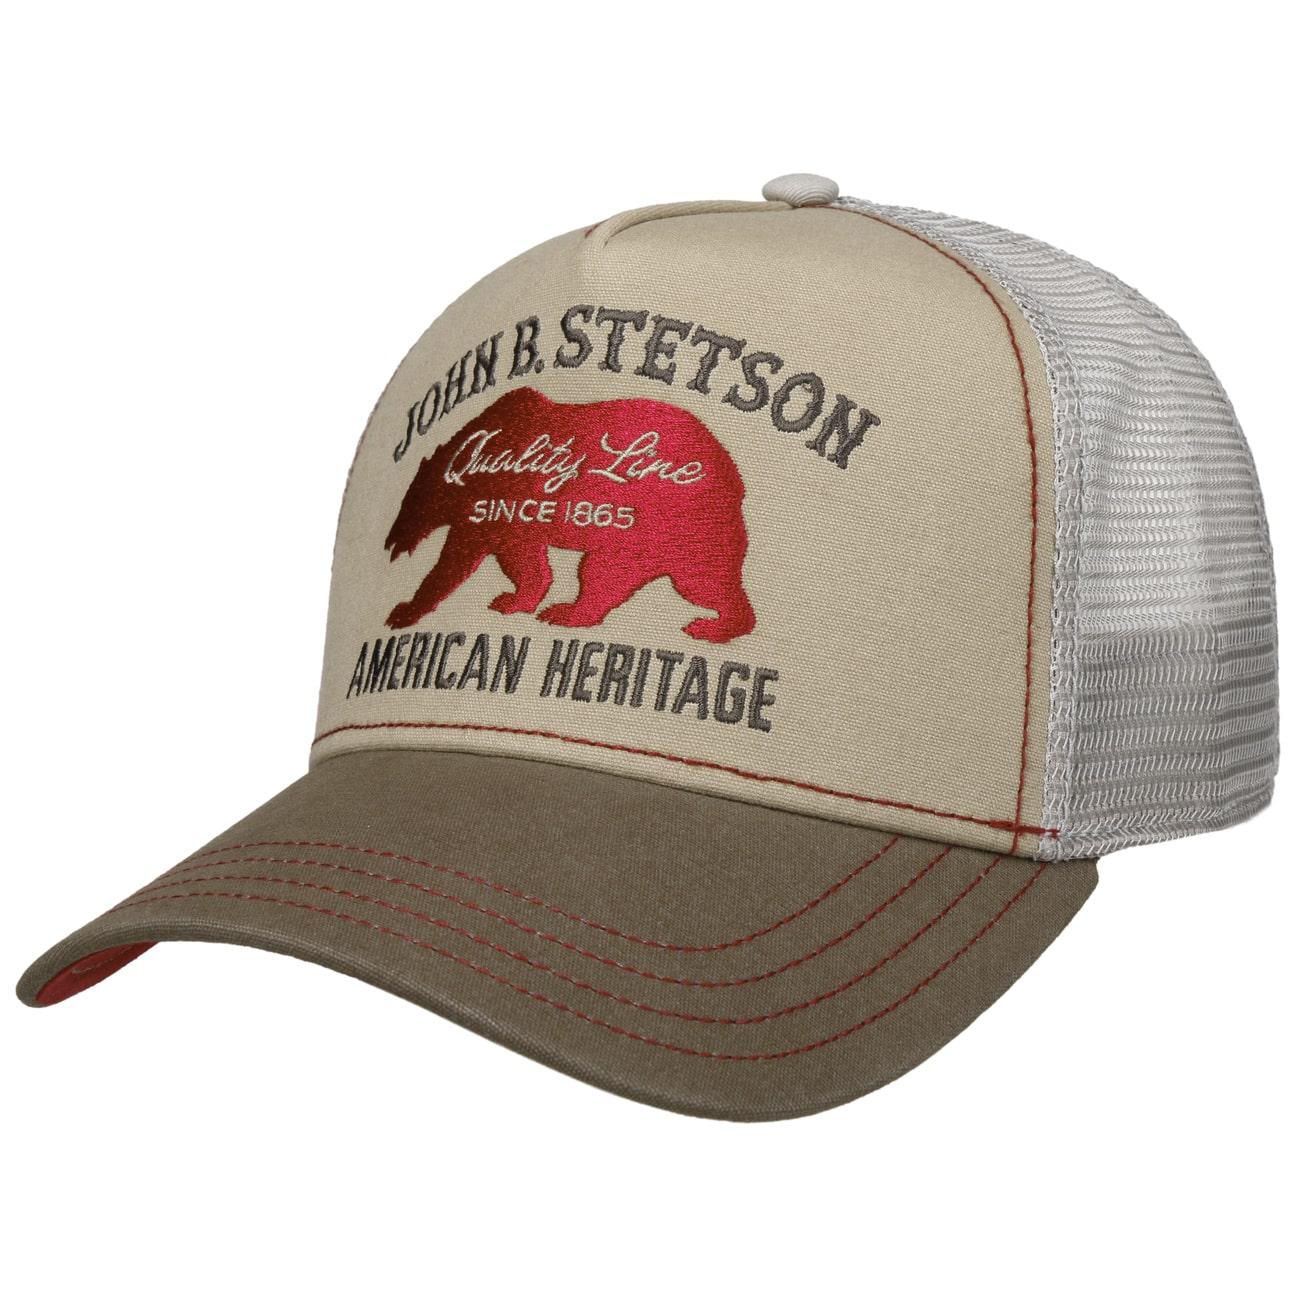 jbs-bear-trucker-cap-by-stetson-meshcap